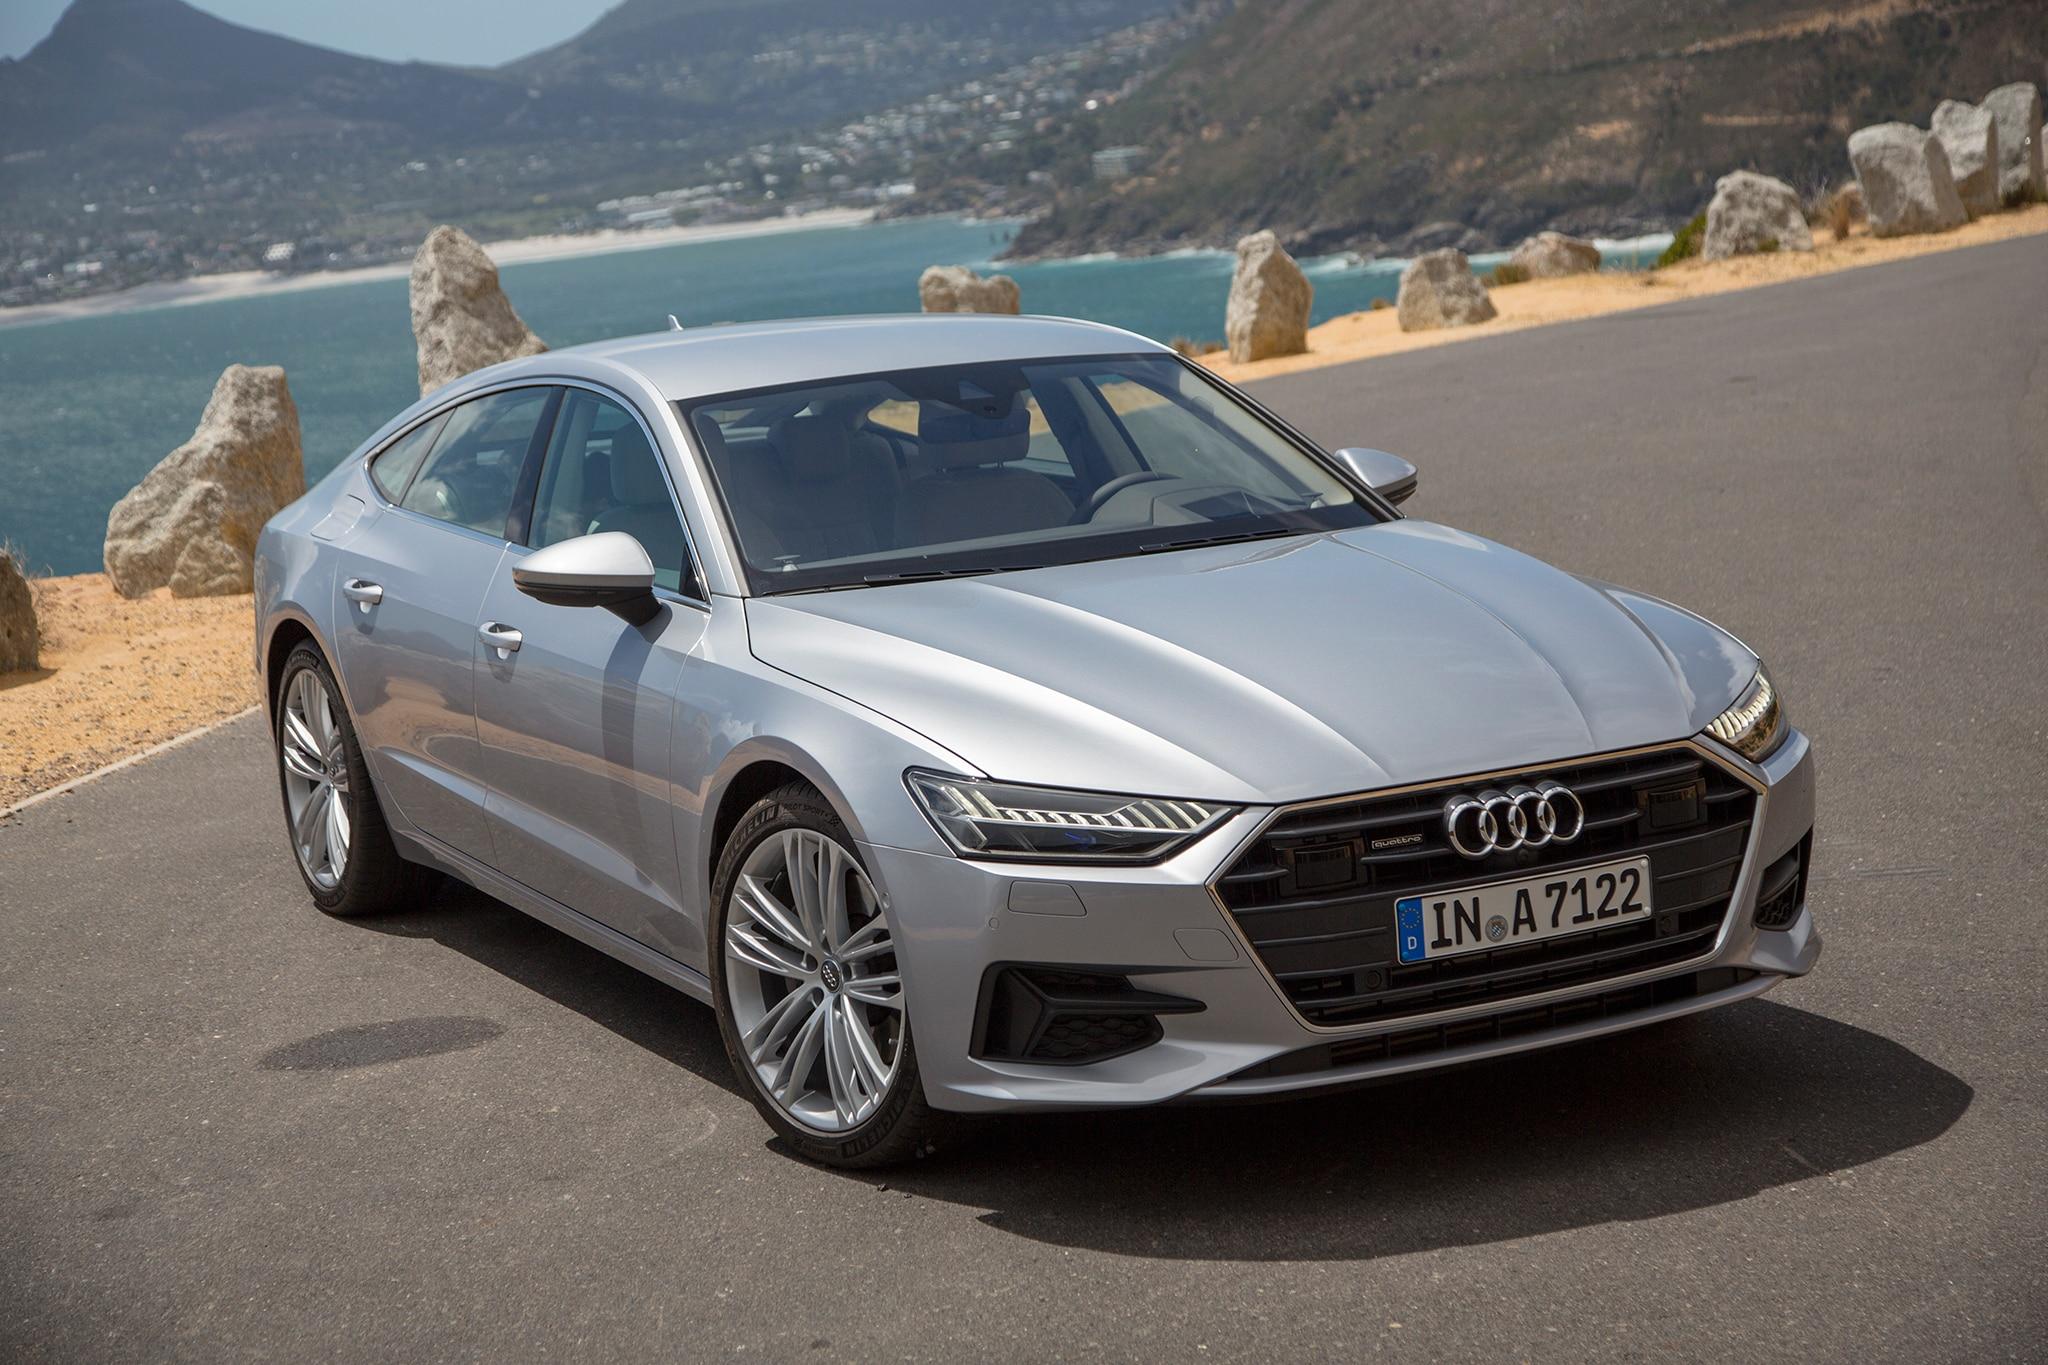 2019 Audi A7 Sportback First Drive Review   Automobile Magazine